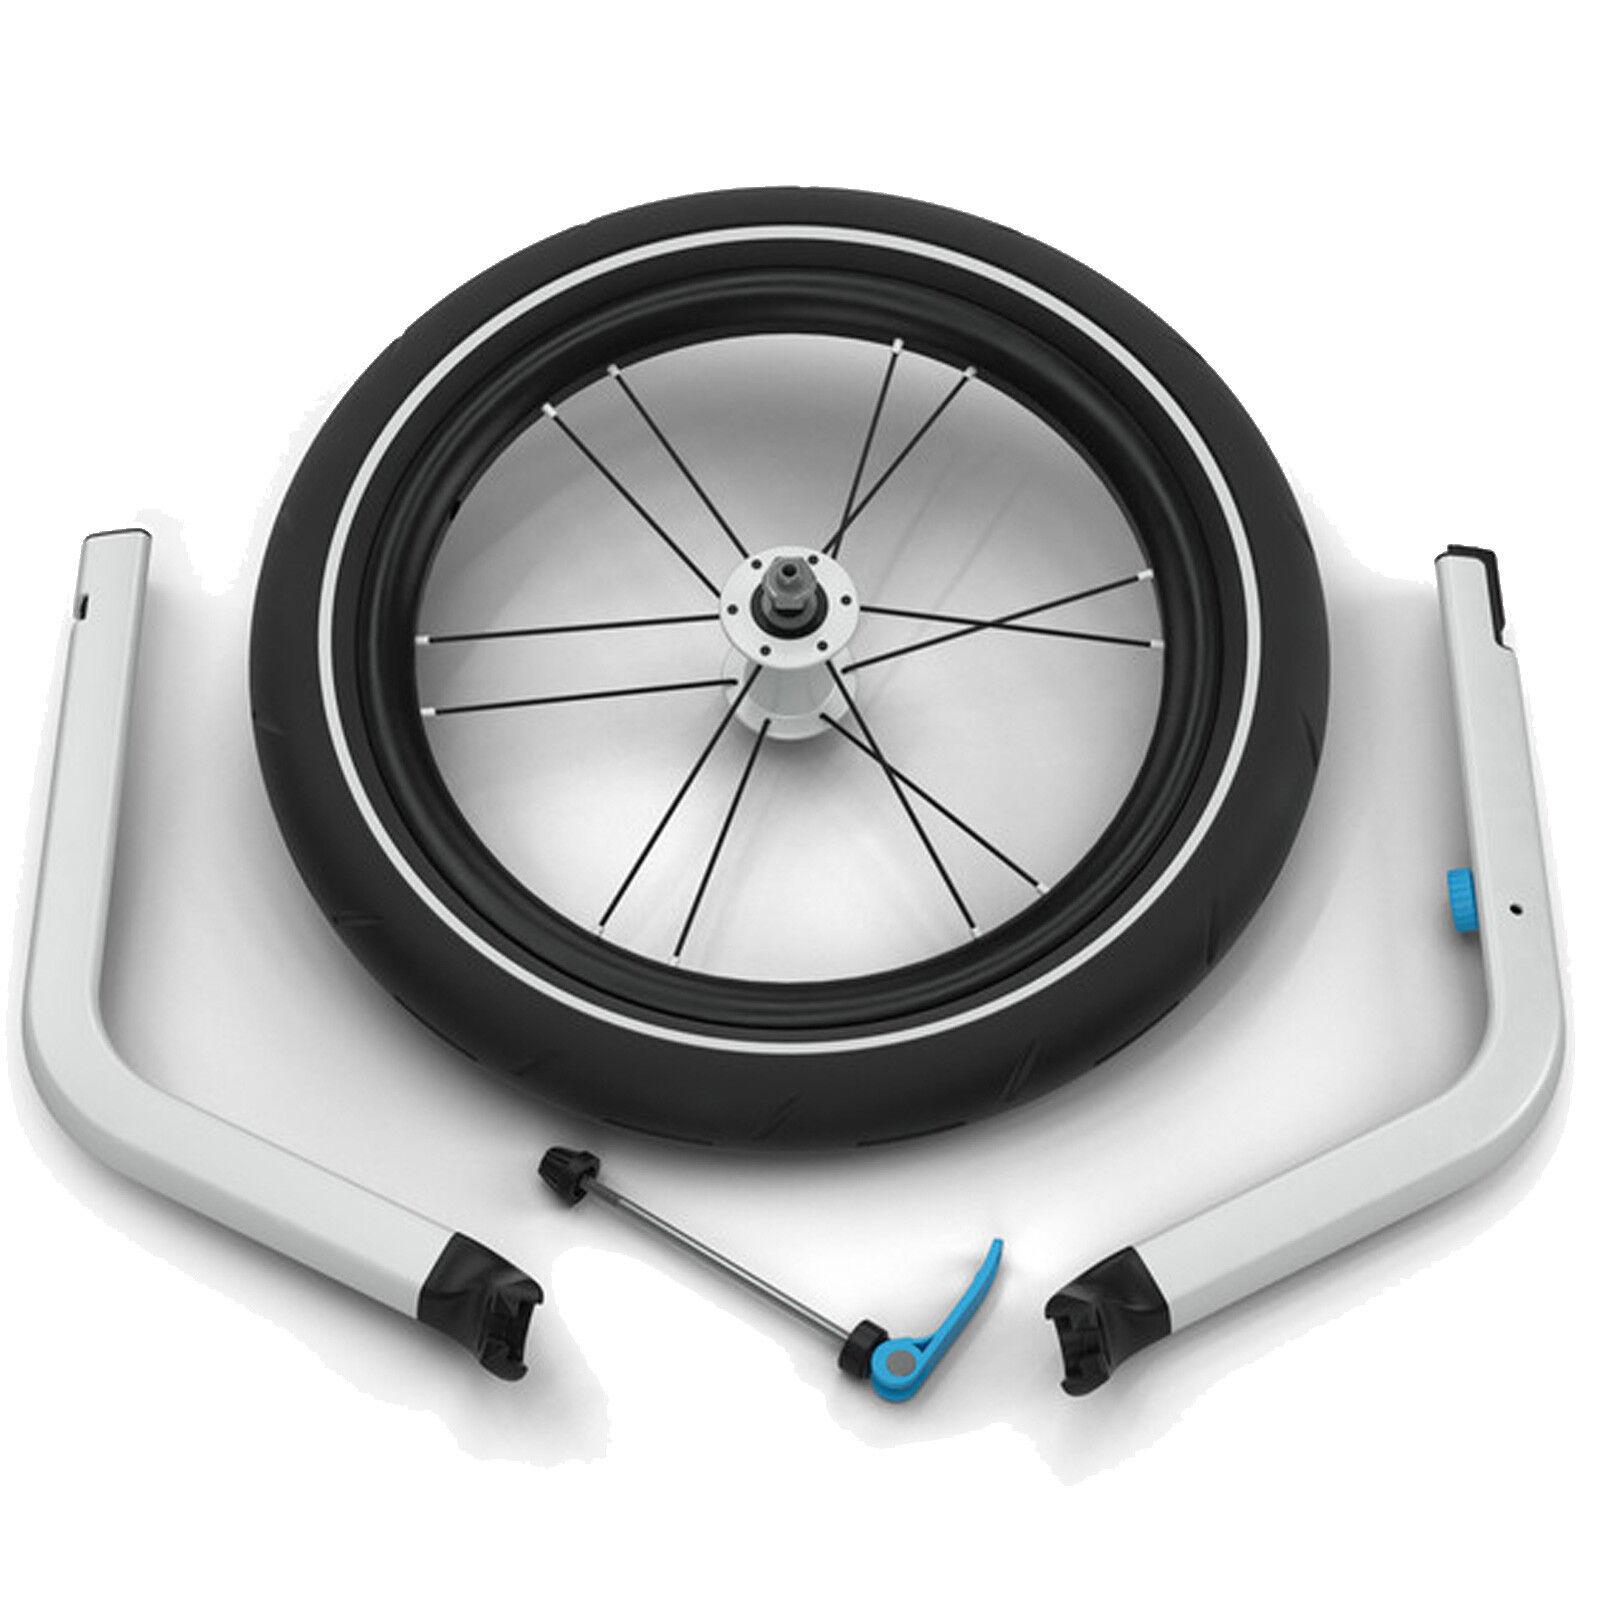 Thule Chariot Jogging Kit Fahrradanhängerzubehör Bici senza Pedali Corsa Ruota